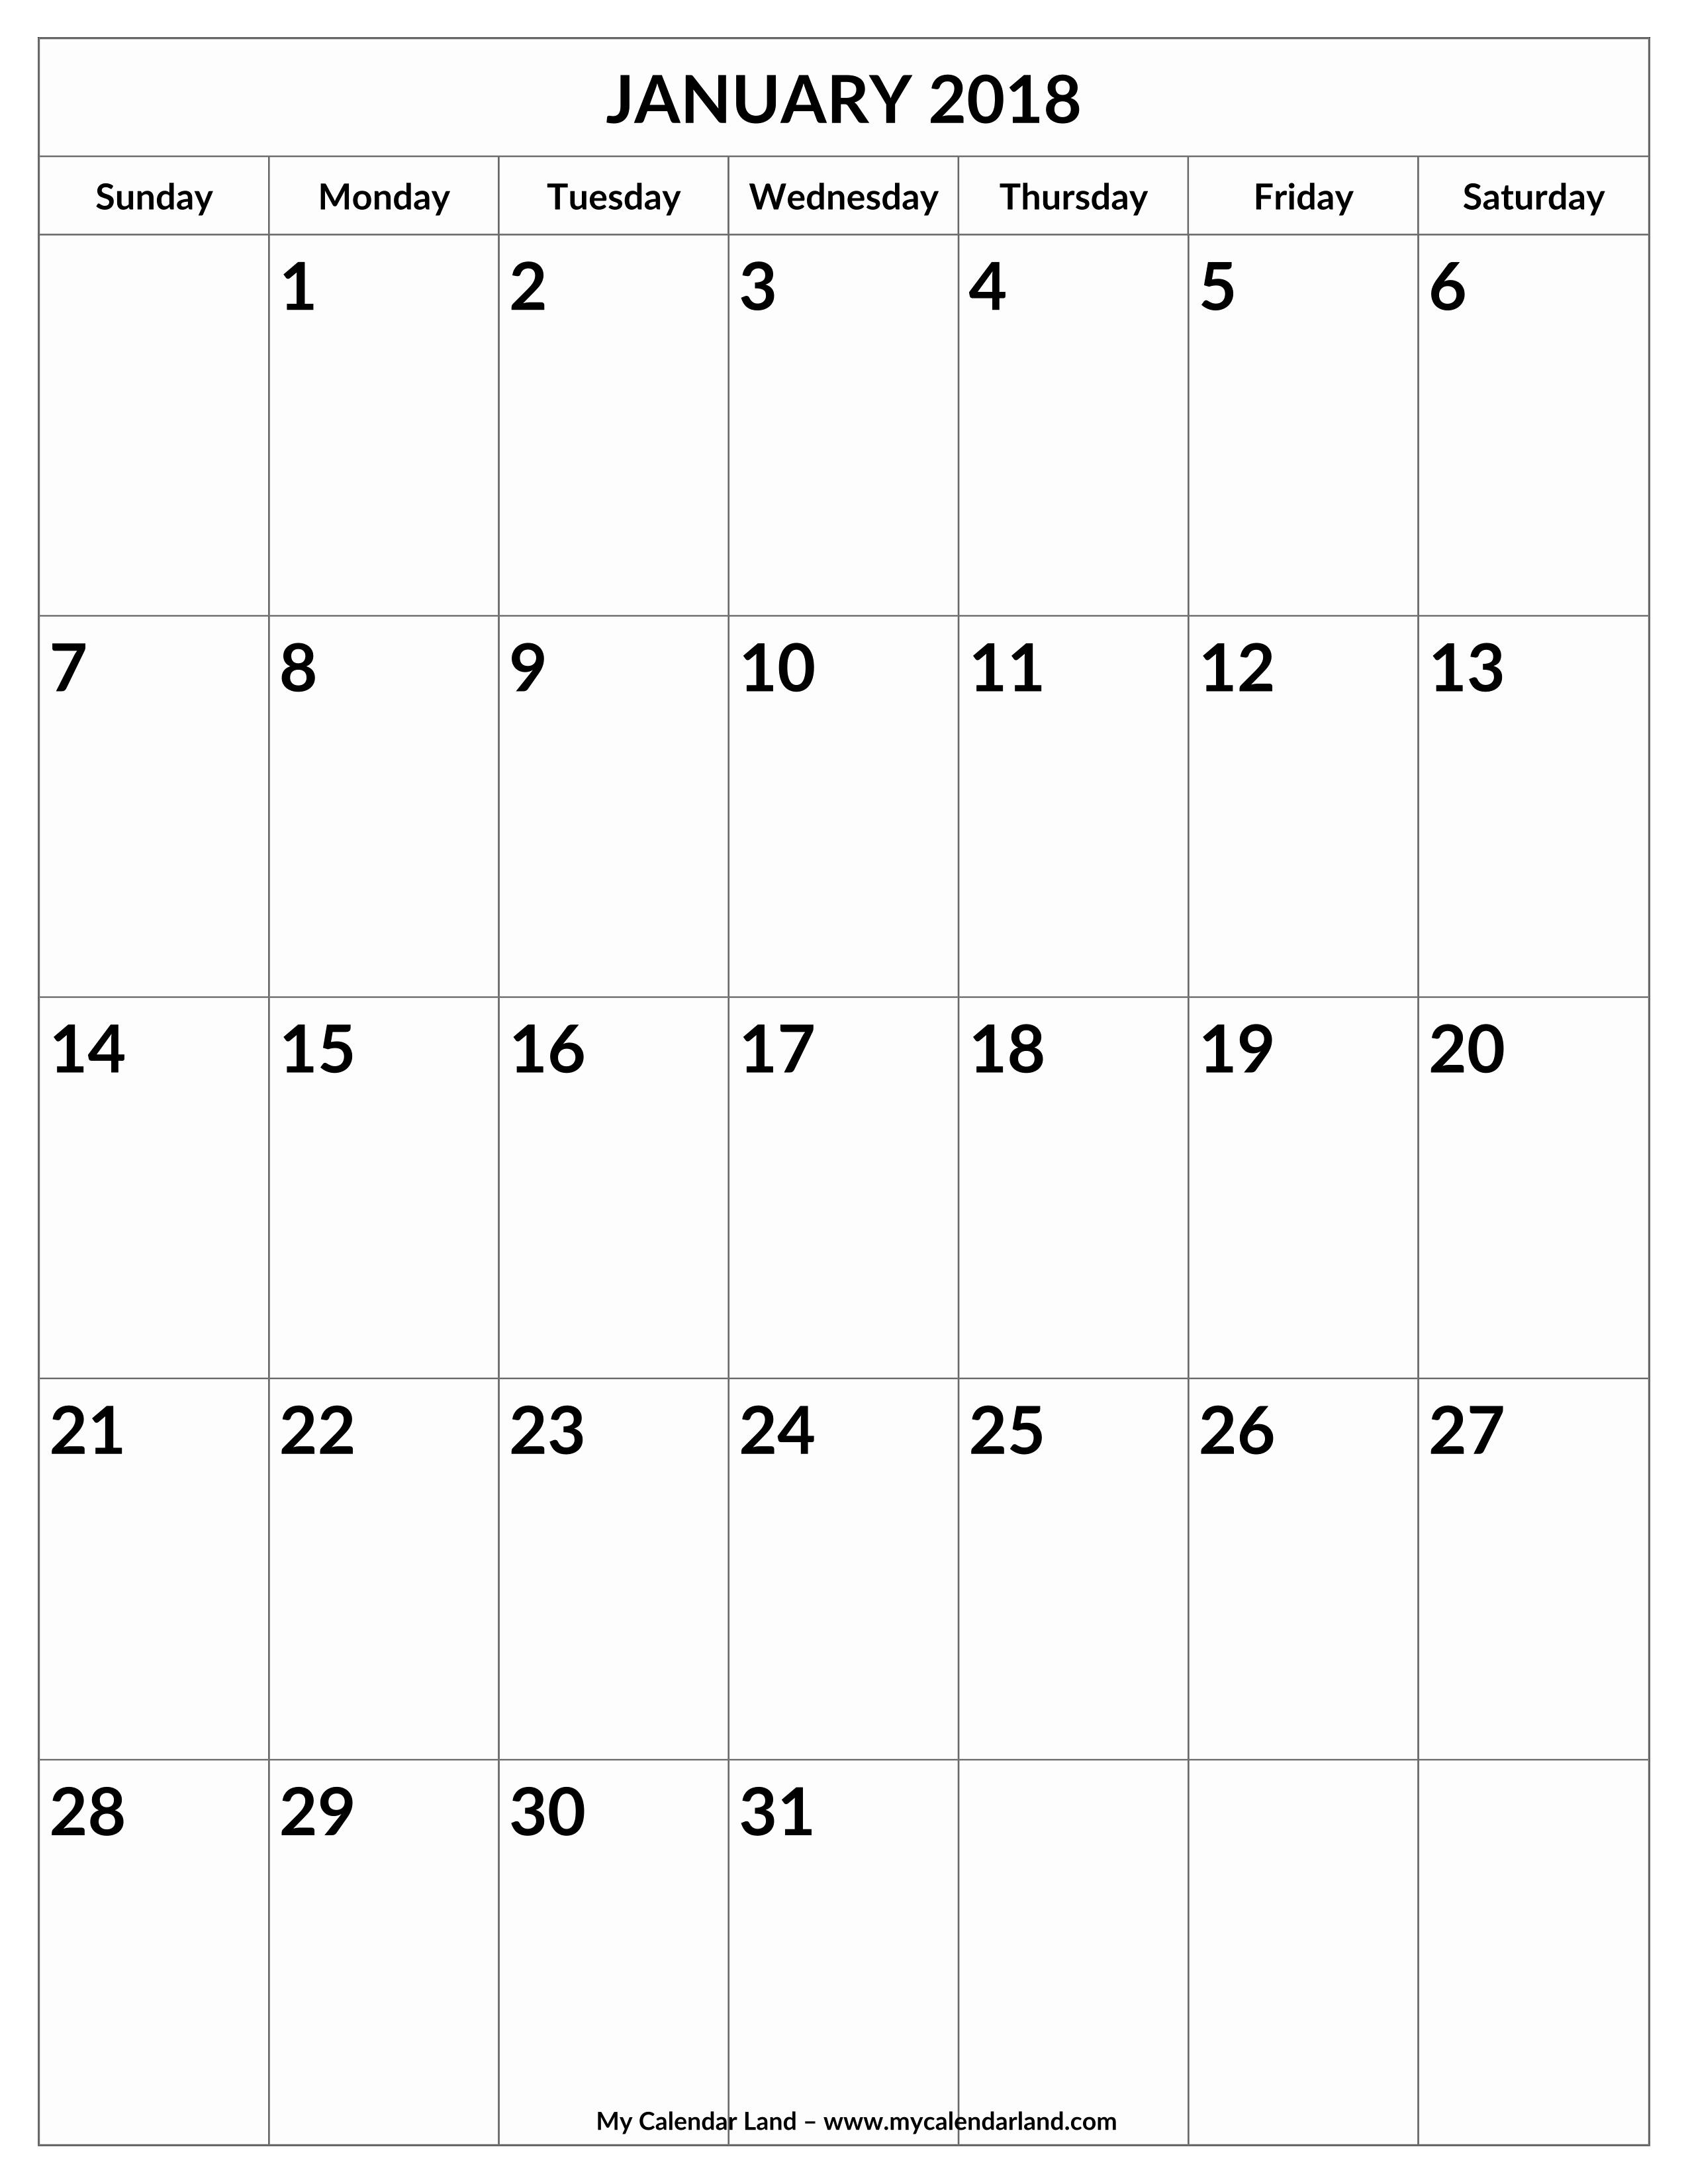 Blank January 2018 Calendar Printable Beautiful January 2018 Calendar My Calendar Land